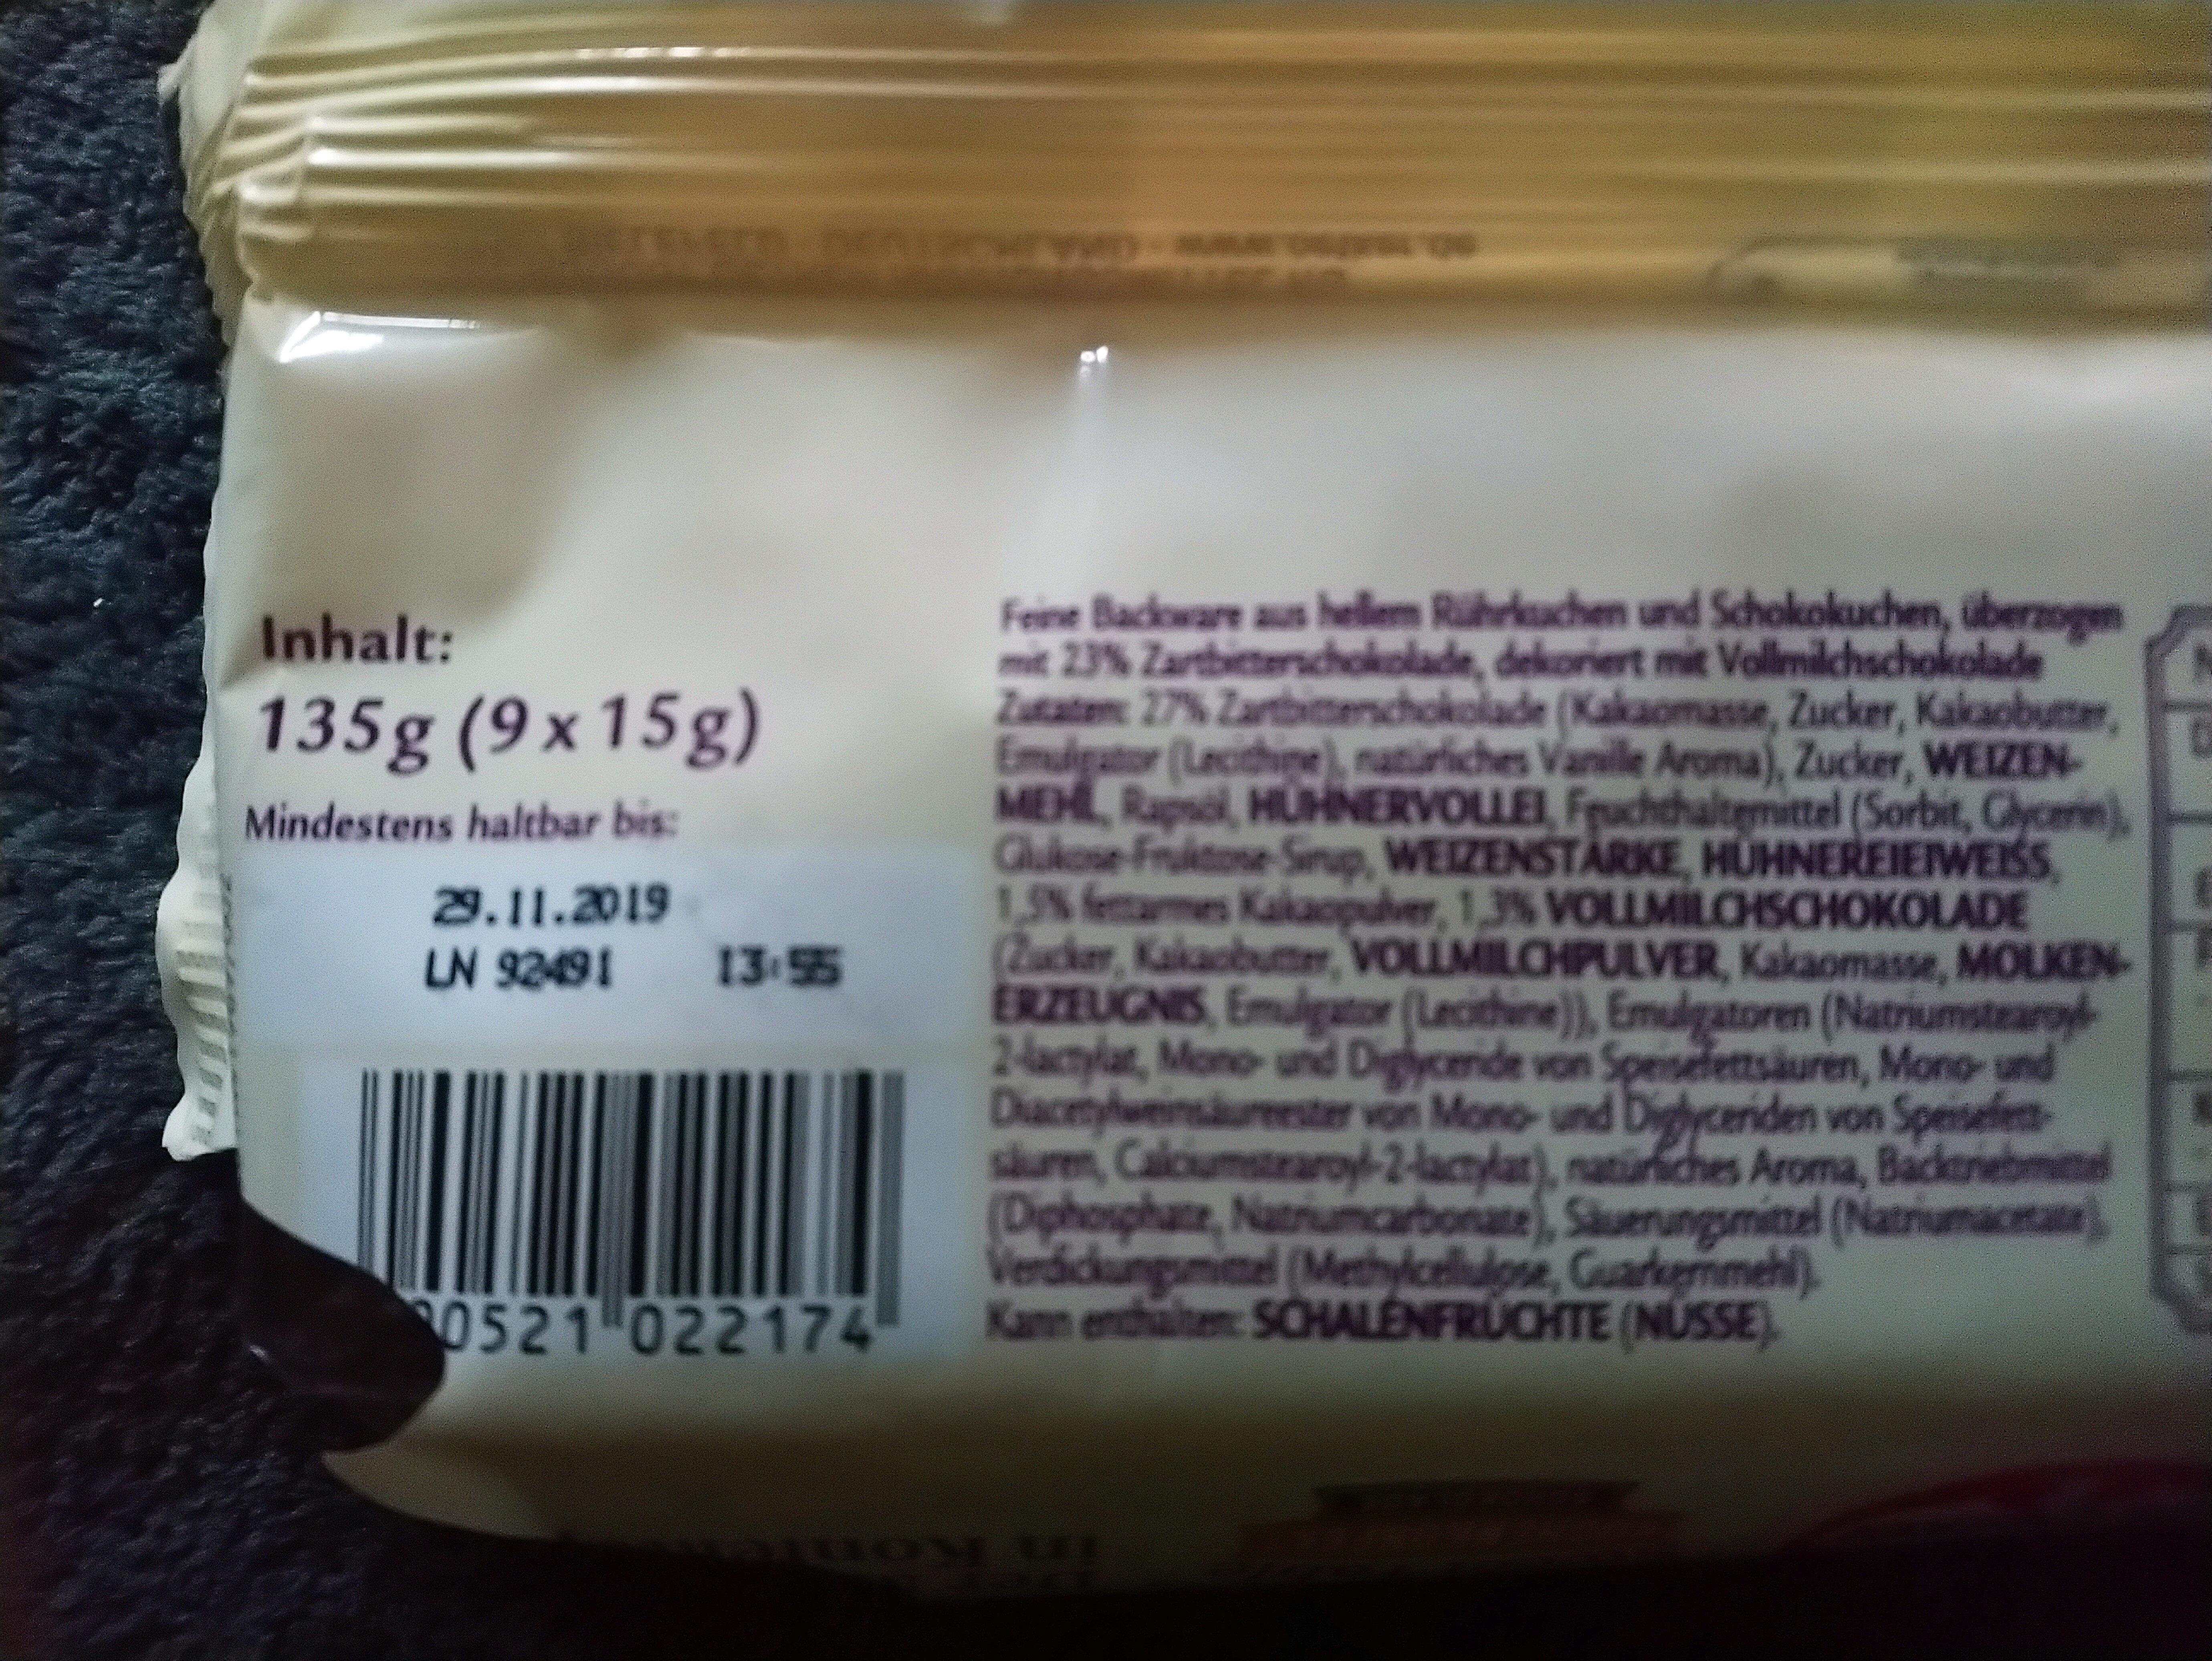 My Sweet Table Kuchenkonfekt Schokolade - Ingrediënten - de